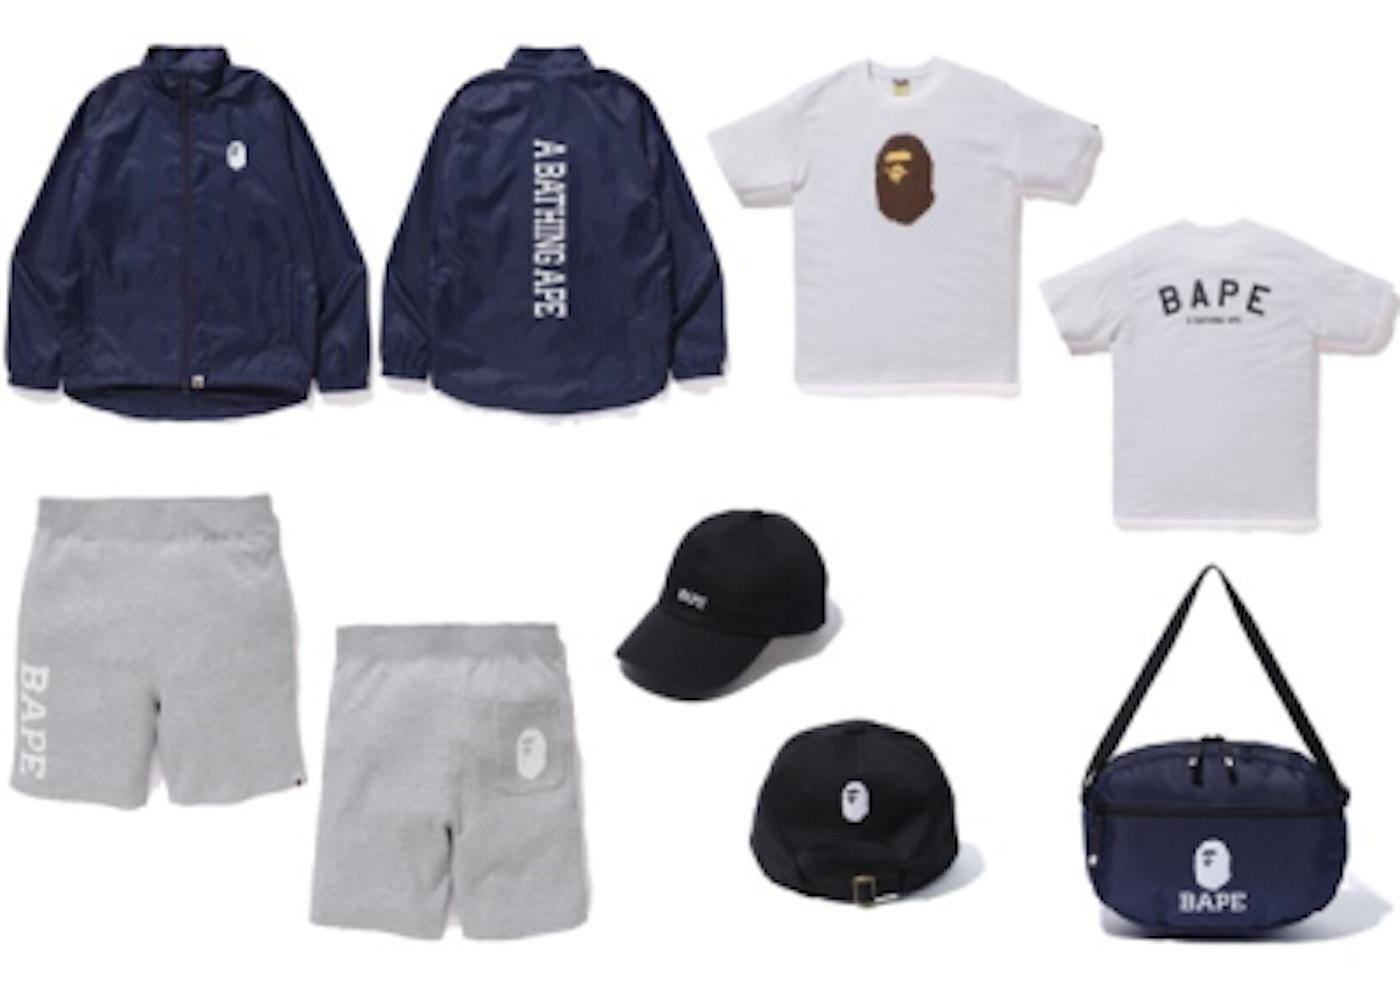 8027571c Buy & Sell Bape Streetwear